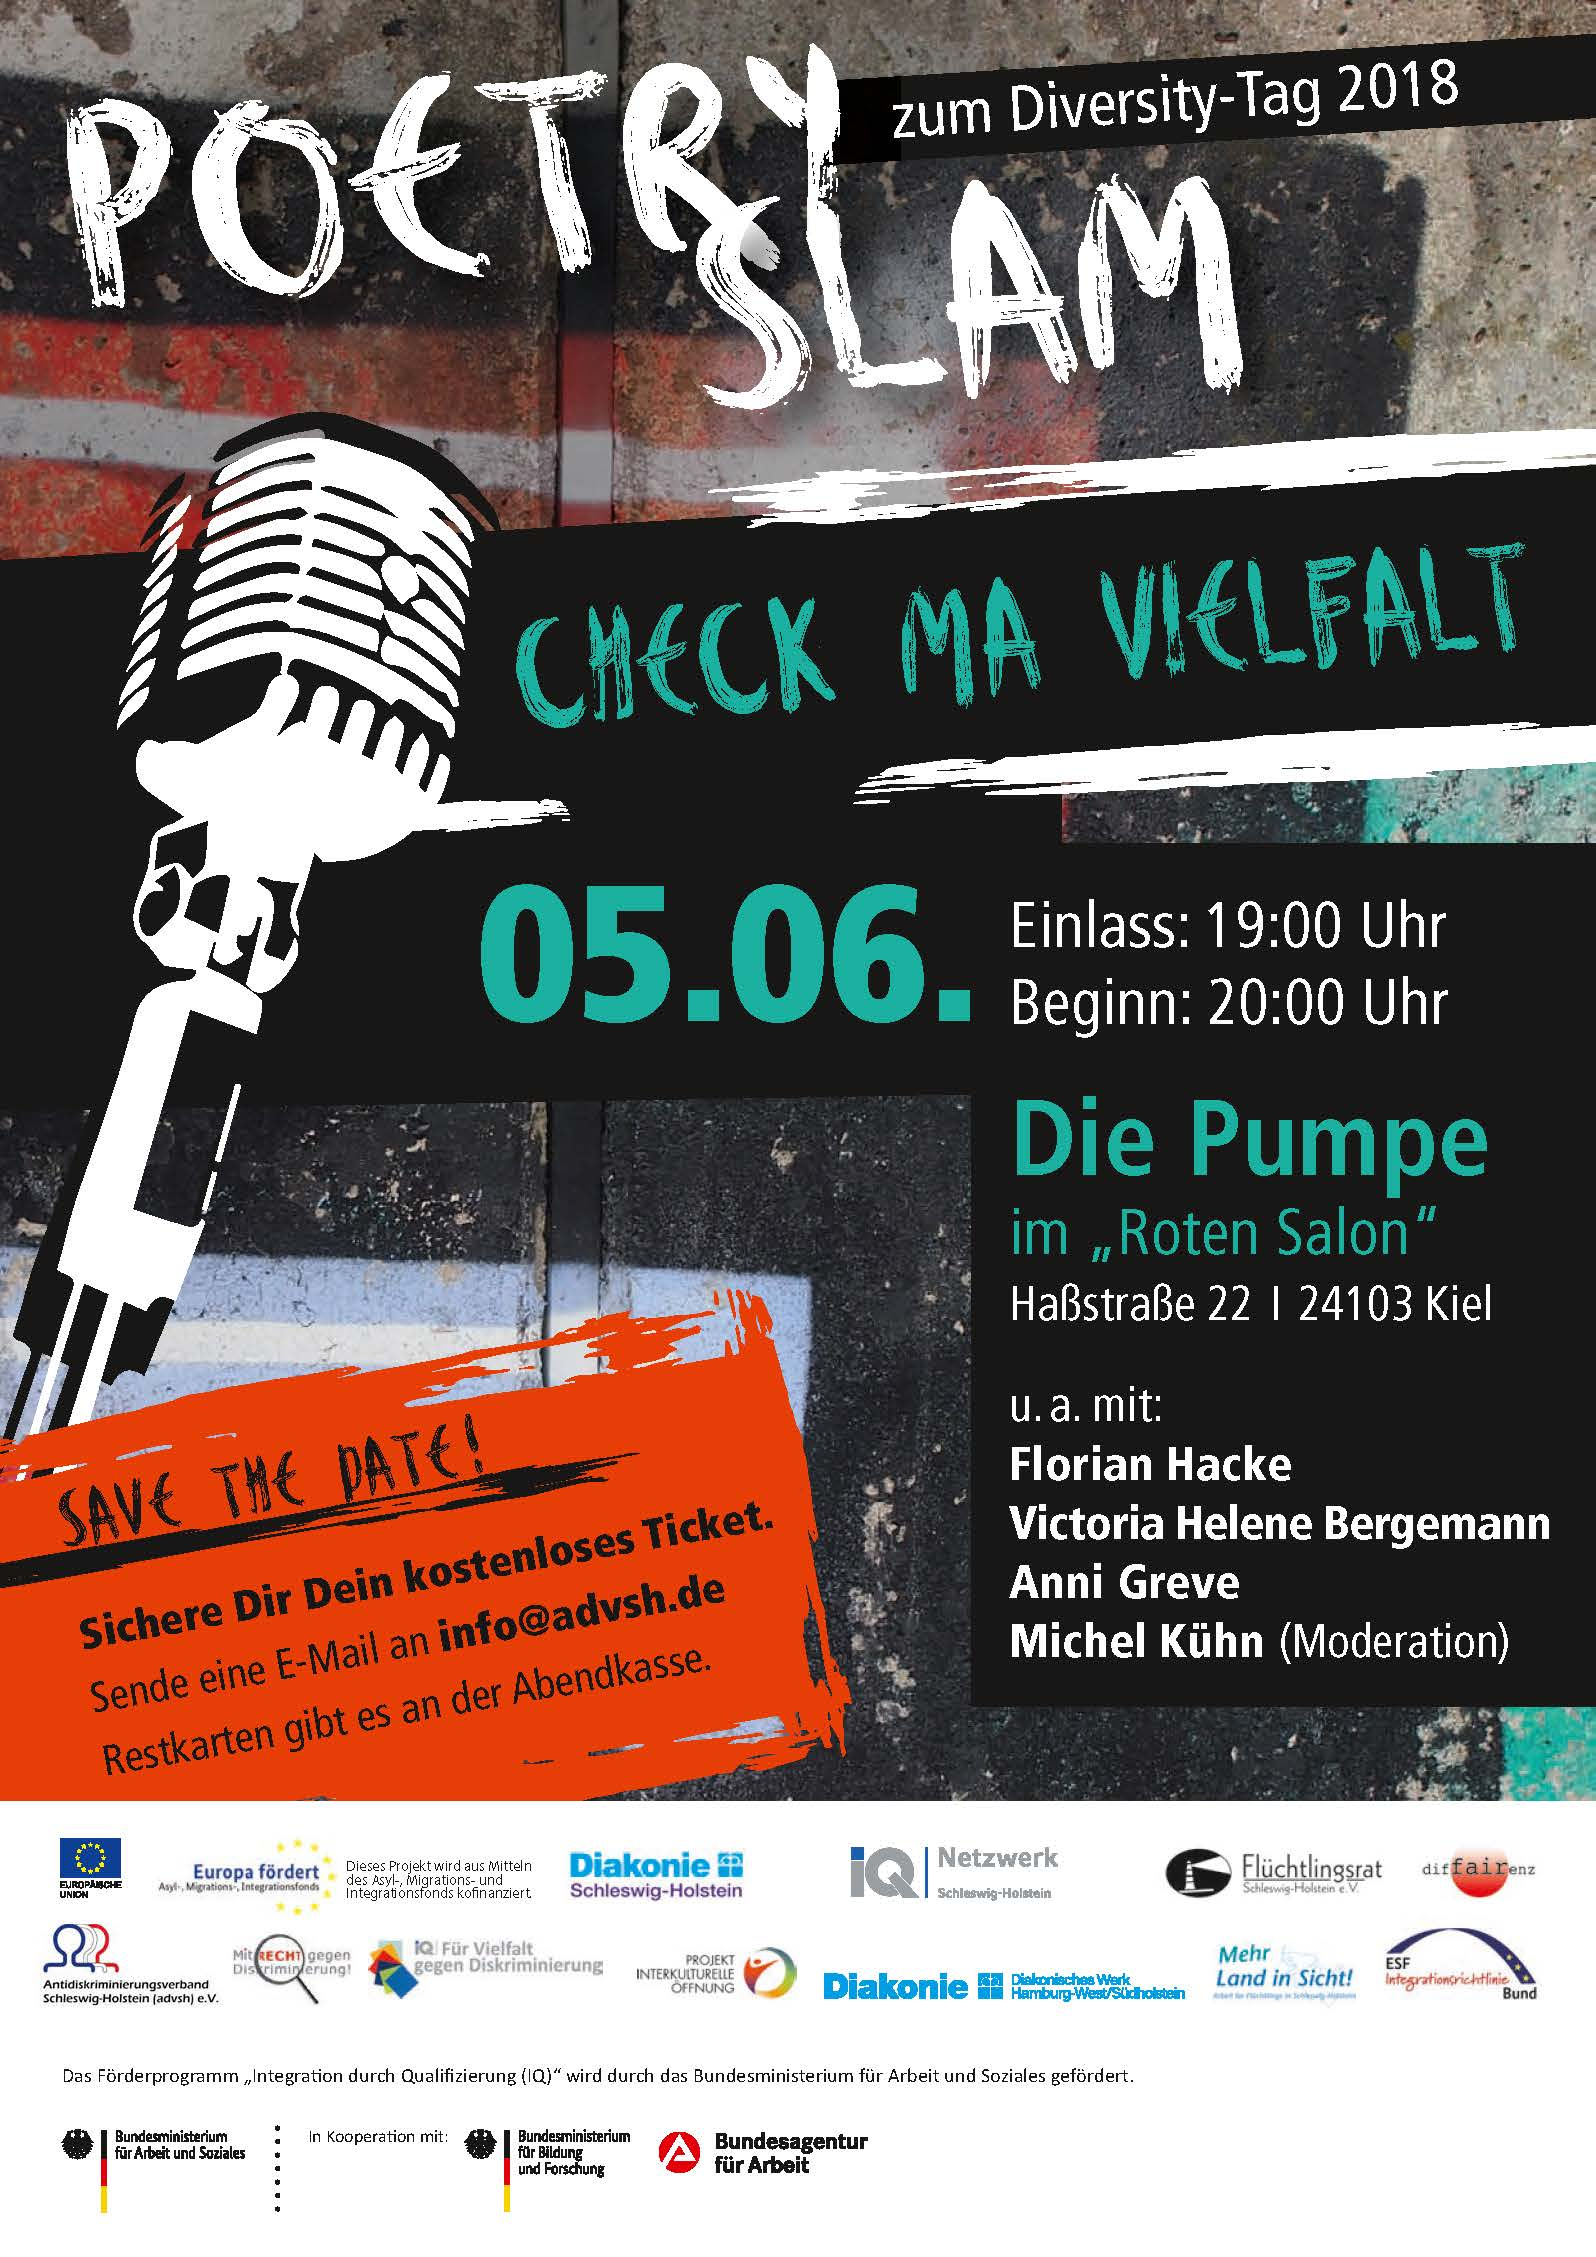 Einladung zum Poetry Slam am Diversity-Tag, dem 05.06.2018